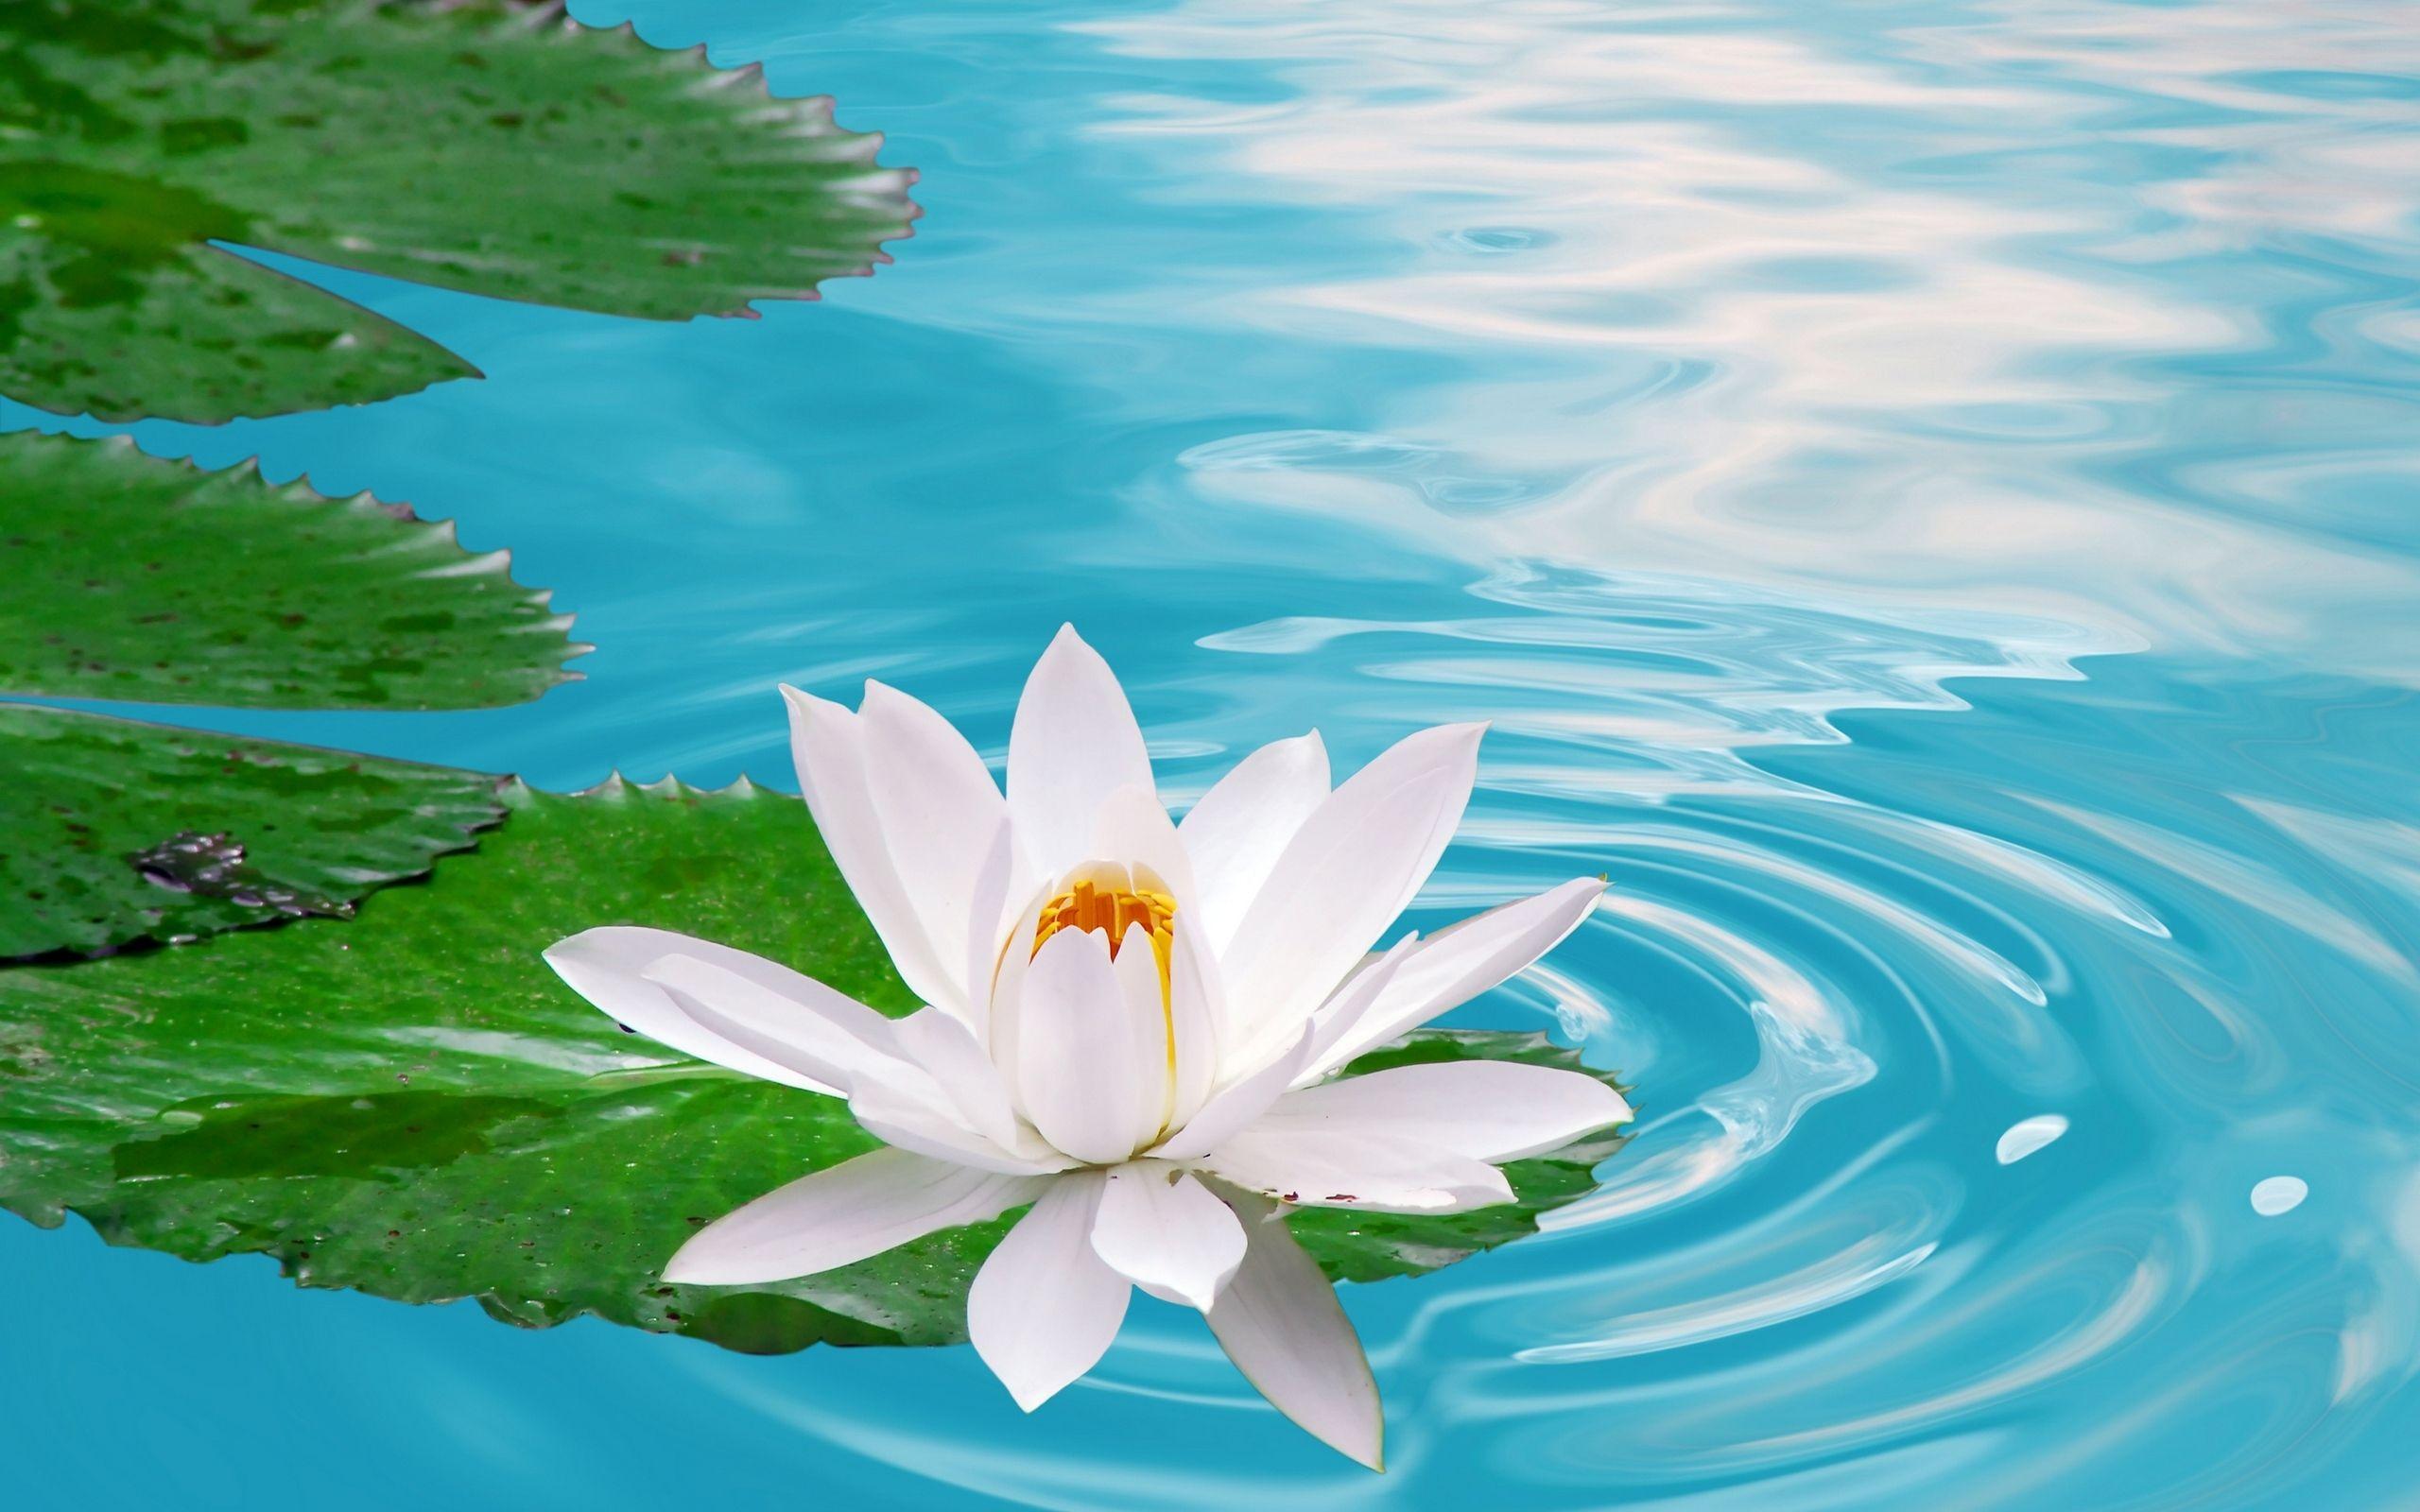 Lotus Flower Wallpapers 38 - Lotus Flower , HD Wallpaper & Backgrounds